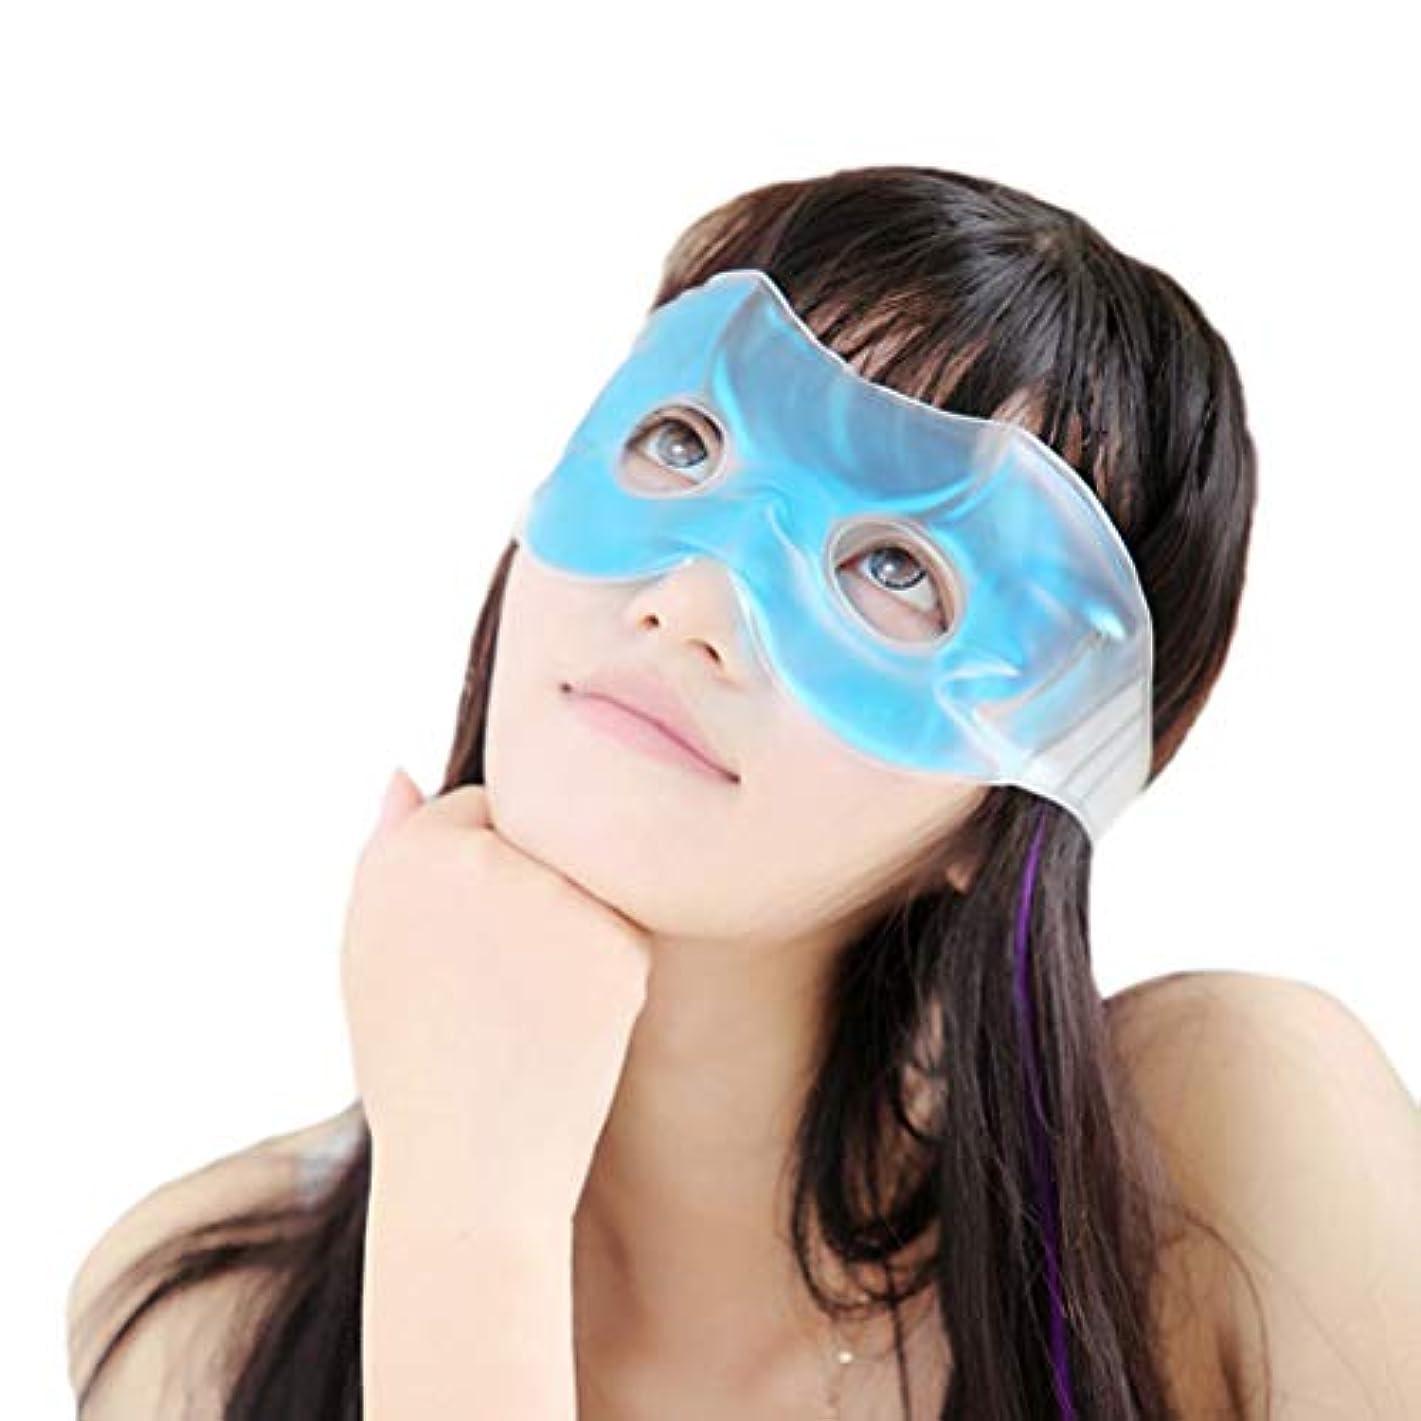 Healifty アイマスク ゲル アイスパッド アイスアイマスク 目隠し リラックス 冷却 パック 再使用可能 目の疲れ軽減 安眠 血行促進